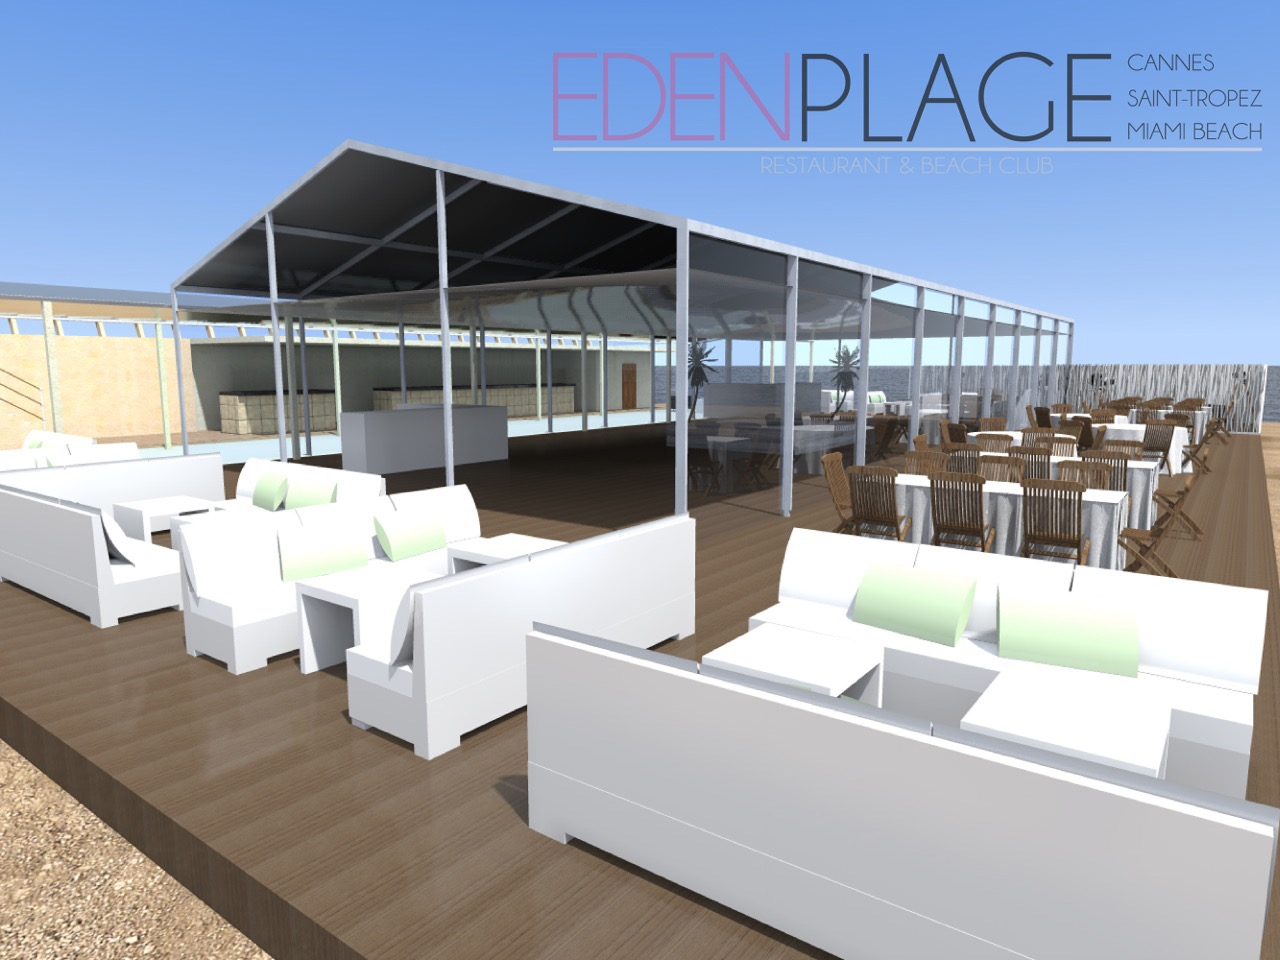 Infosbar Festival Cannes 2015 : Eden Plage